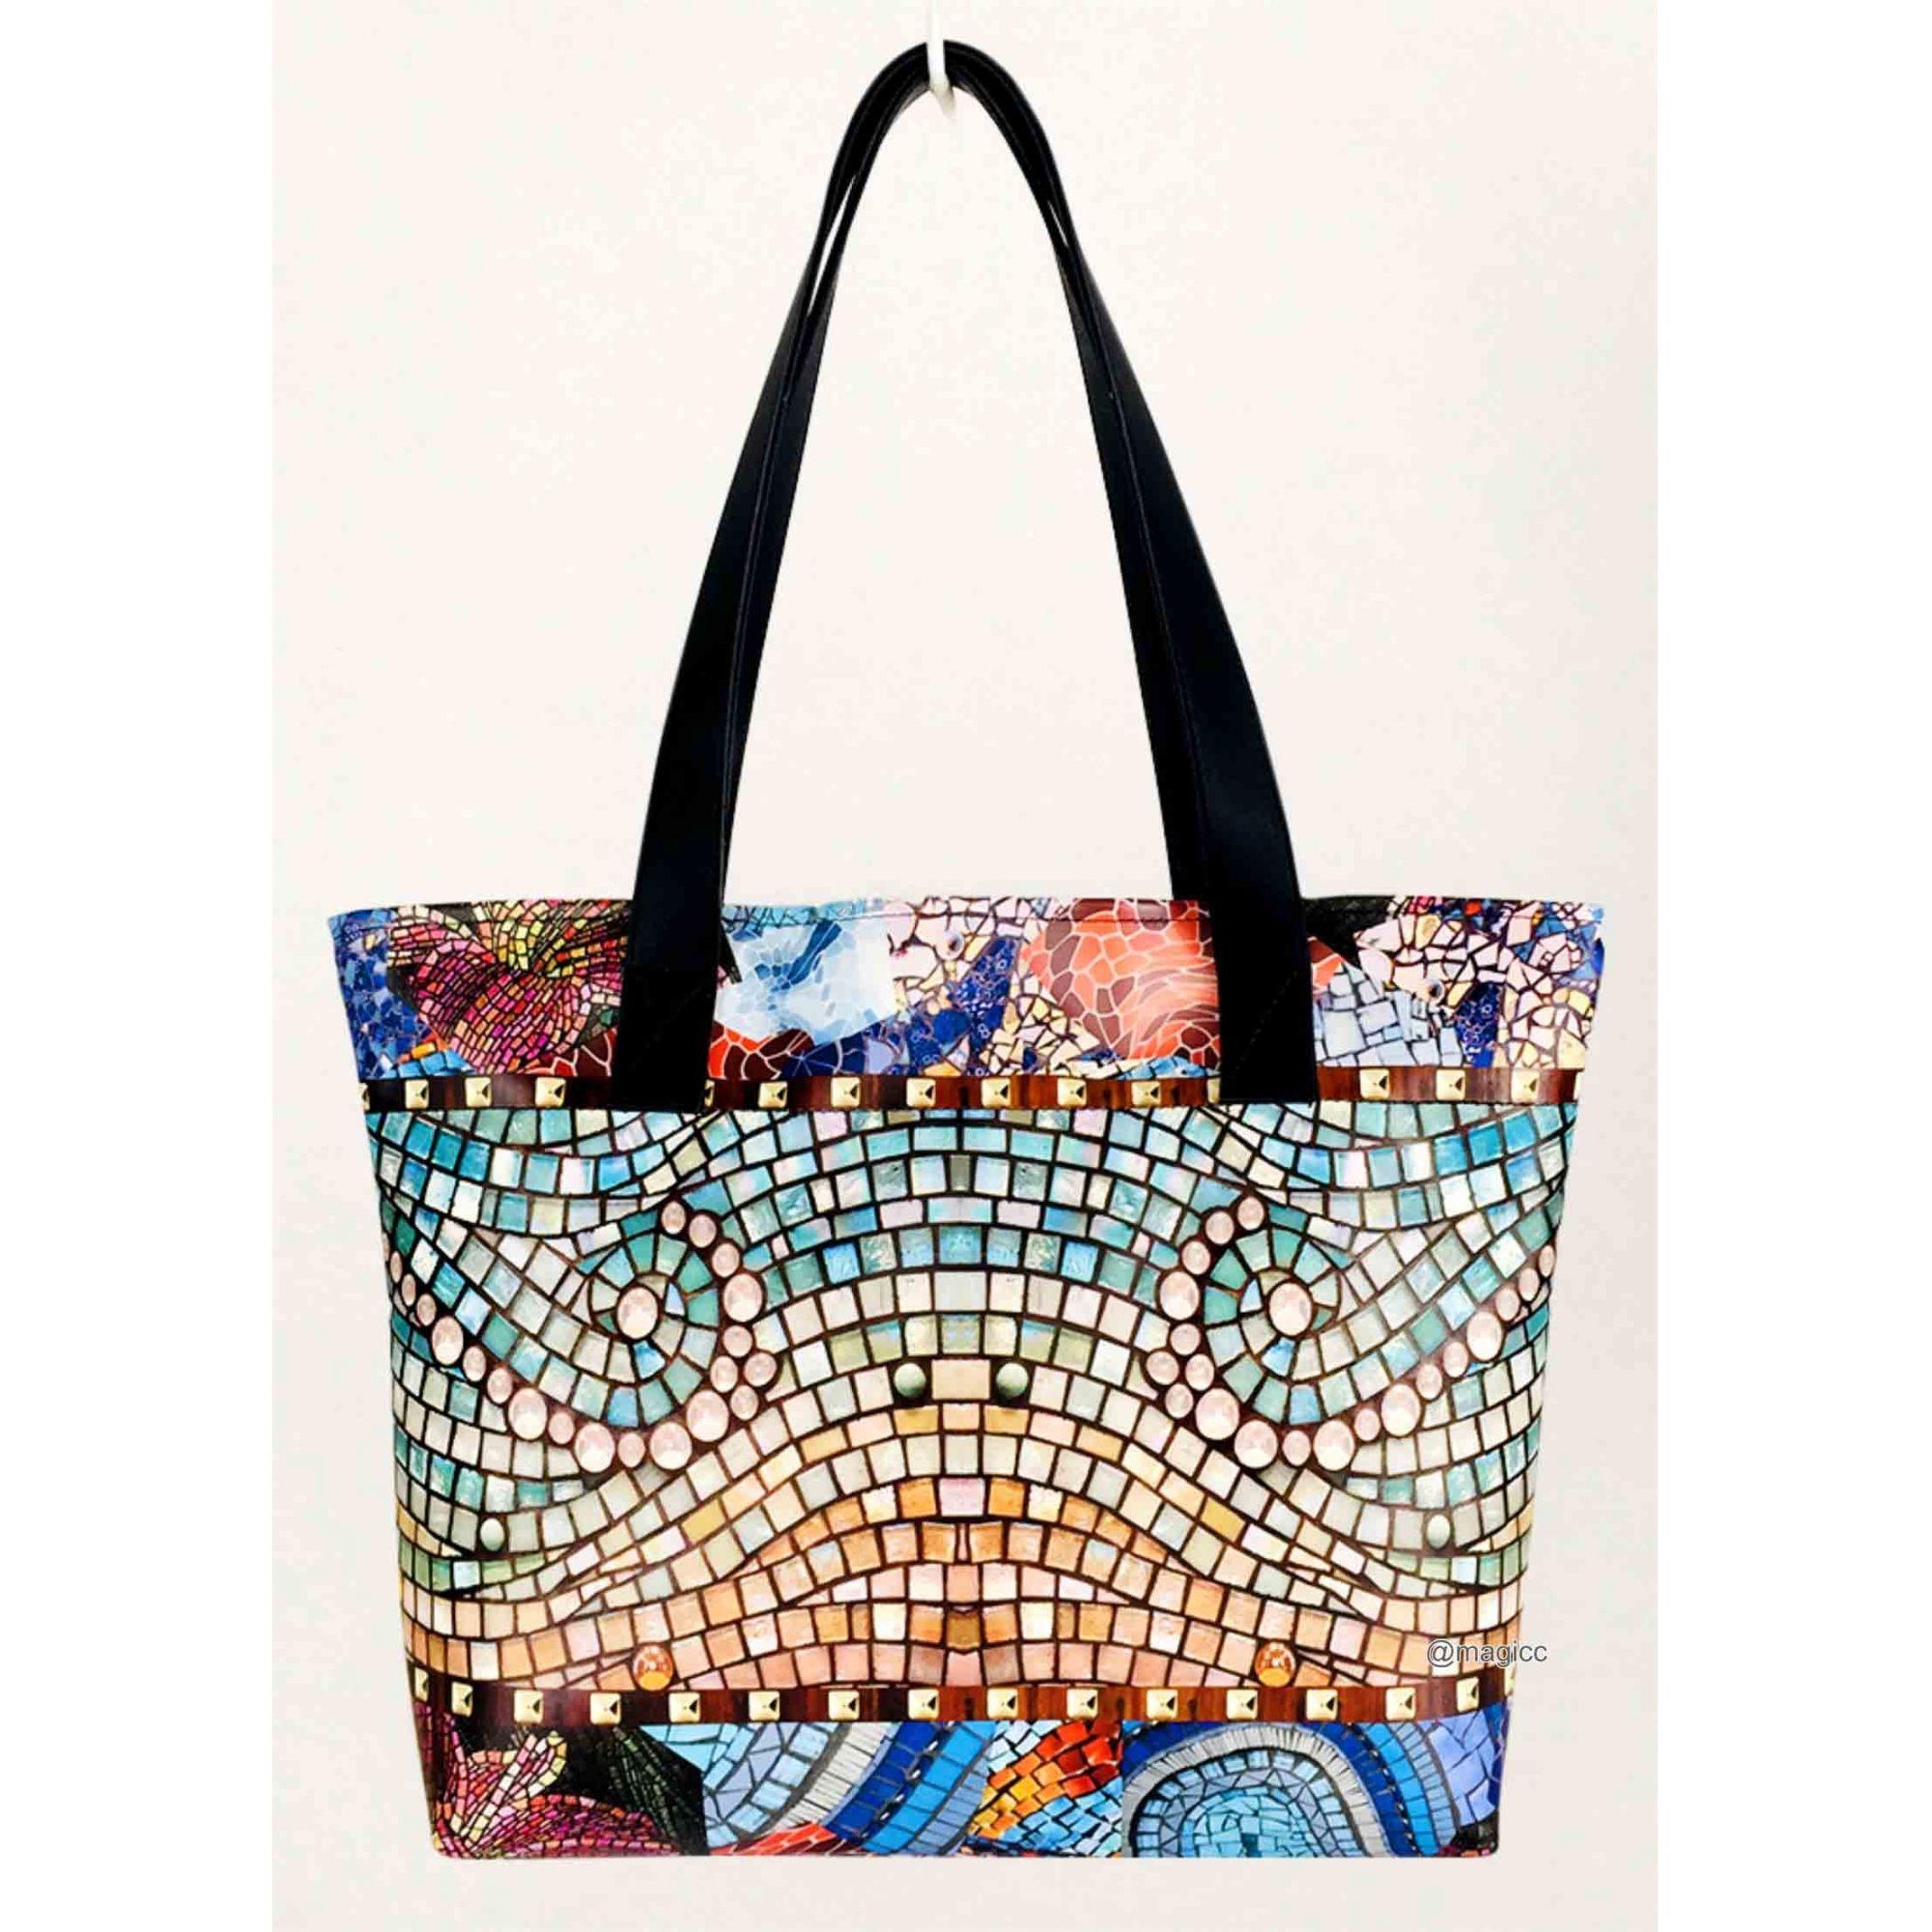 Kit Casual Feminino Mosaico com Bolsa, Necessaire e Chinelo, Magicc